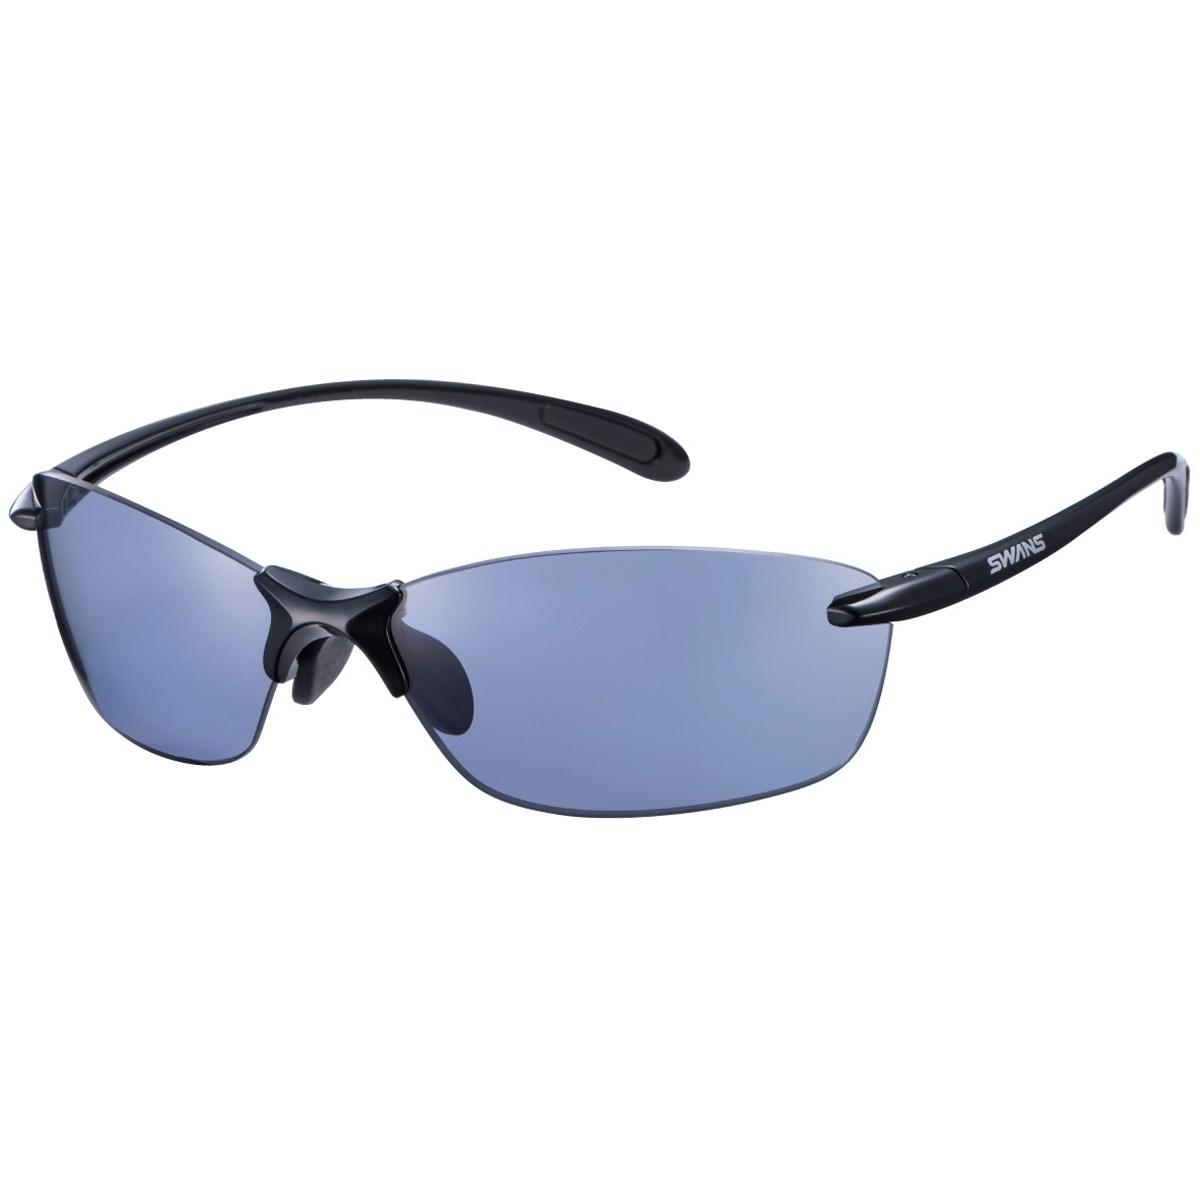 SWANS 偏光レンズ ULTRAレンズ スポーツサングラス